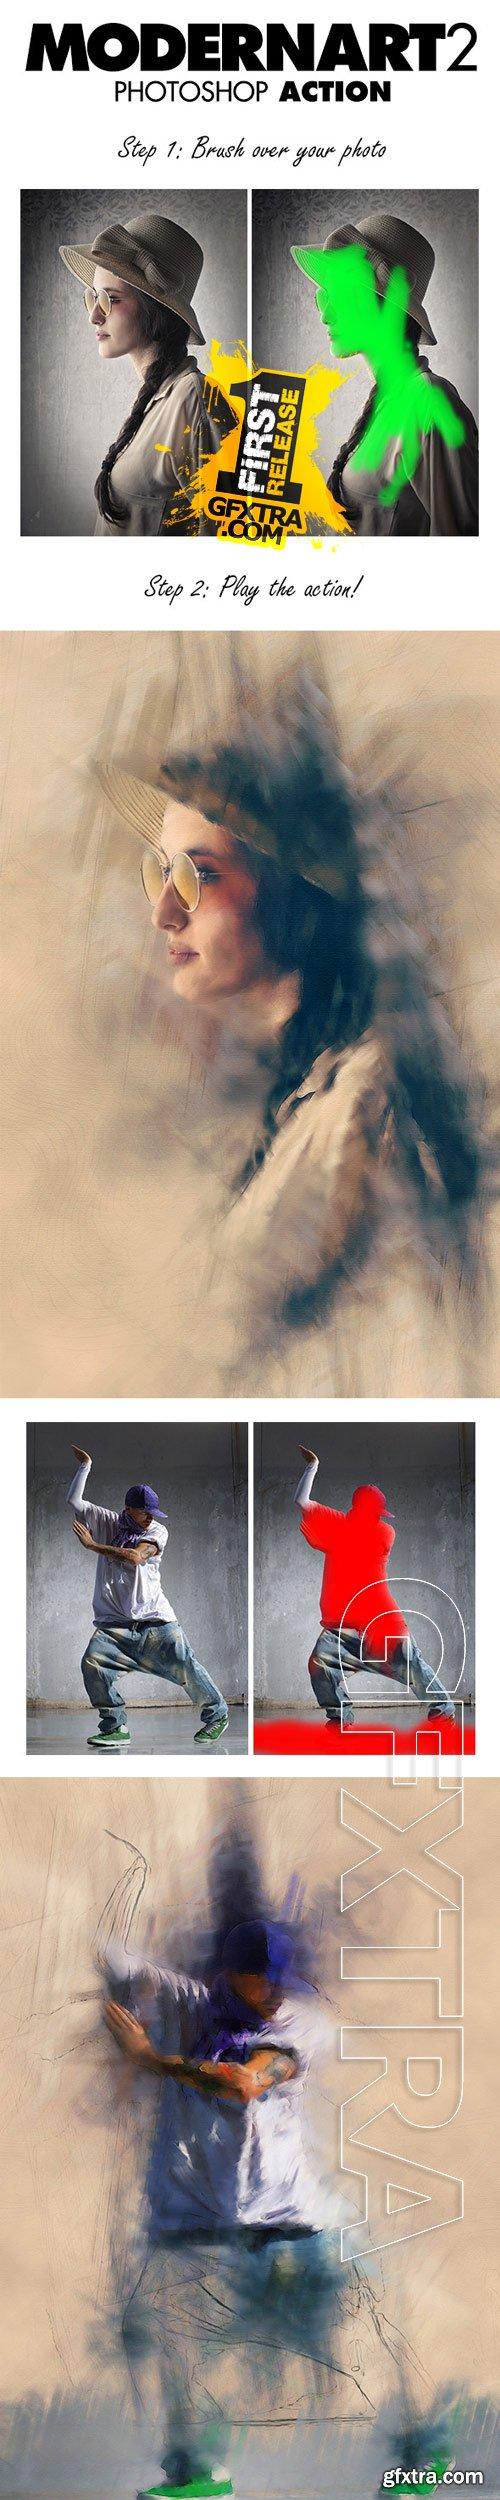 GraphicRiver - ModernArt 2 Photoshop Action 10195965